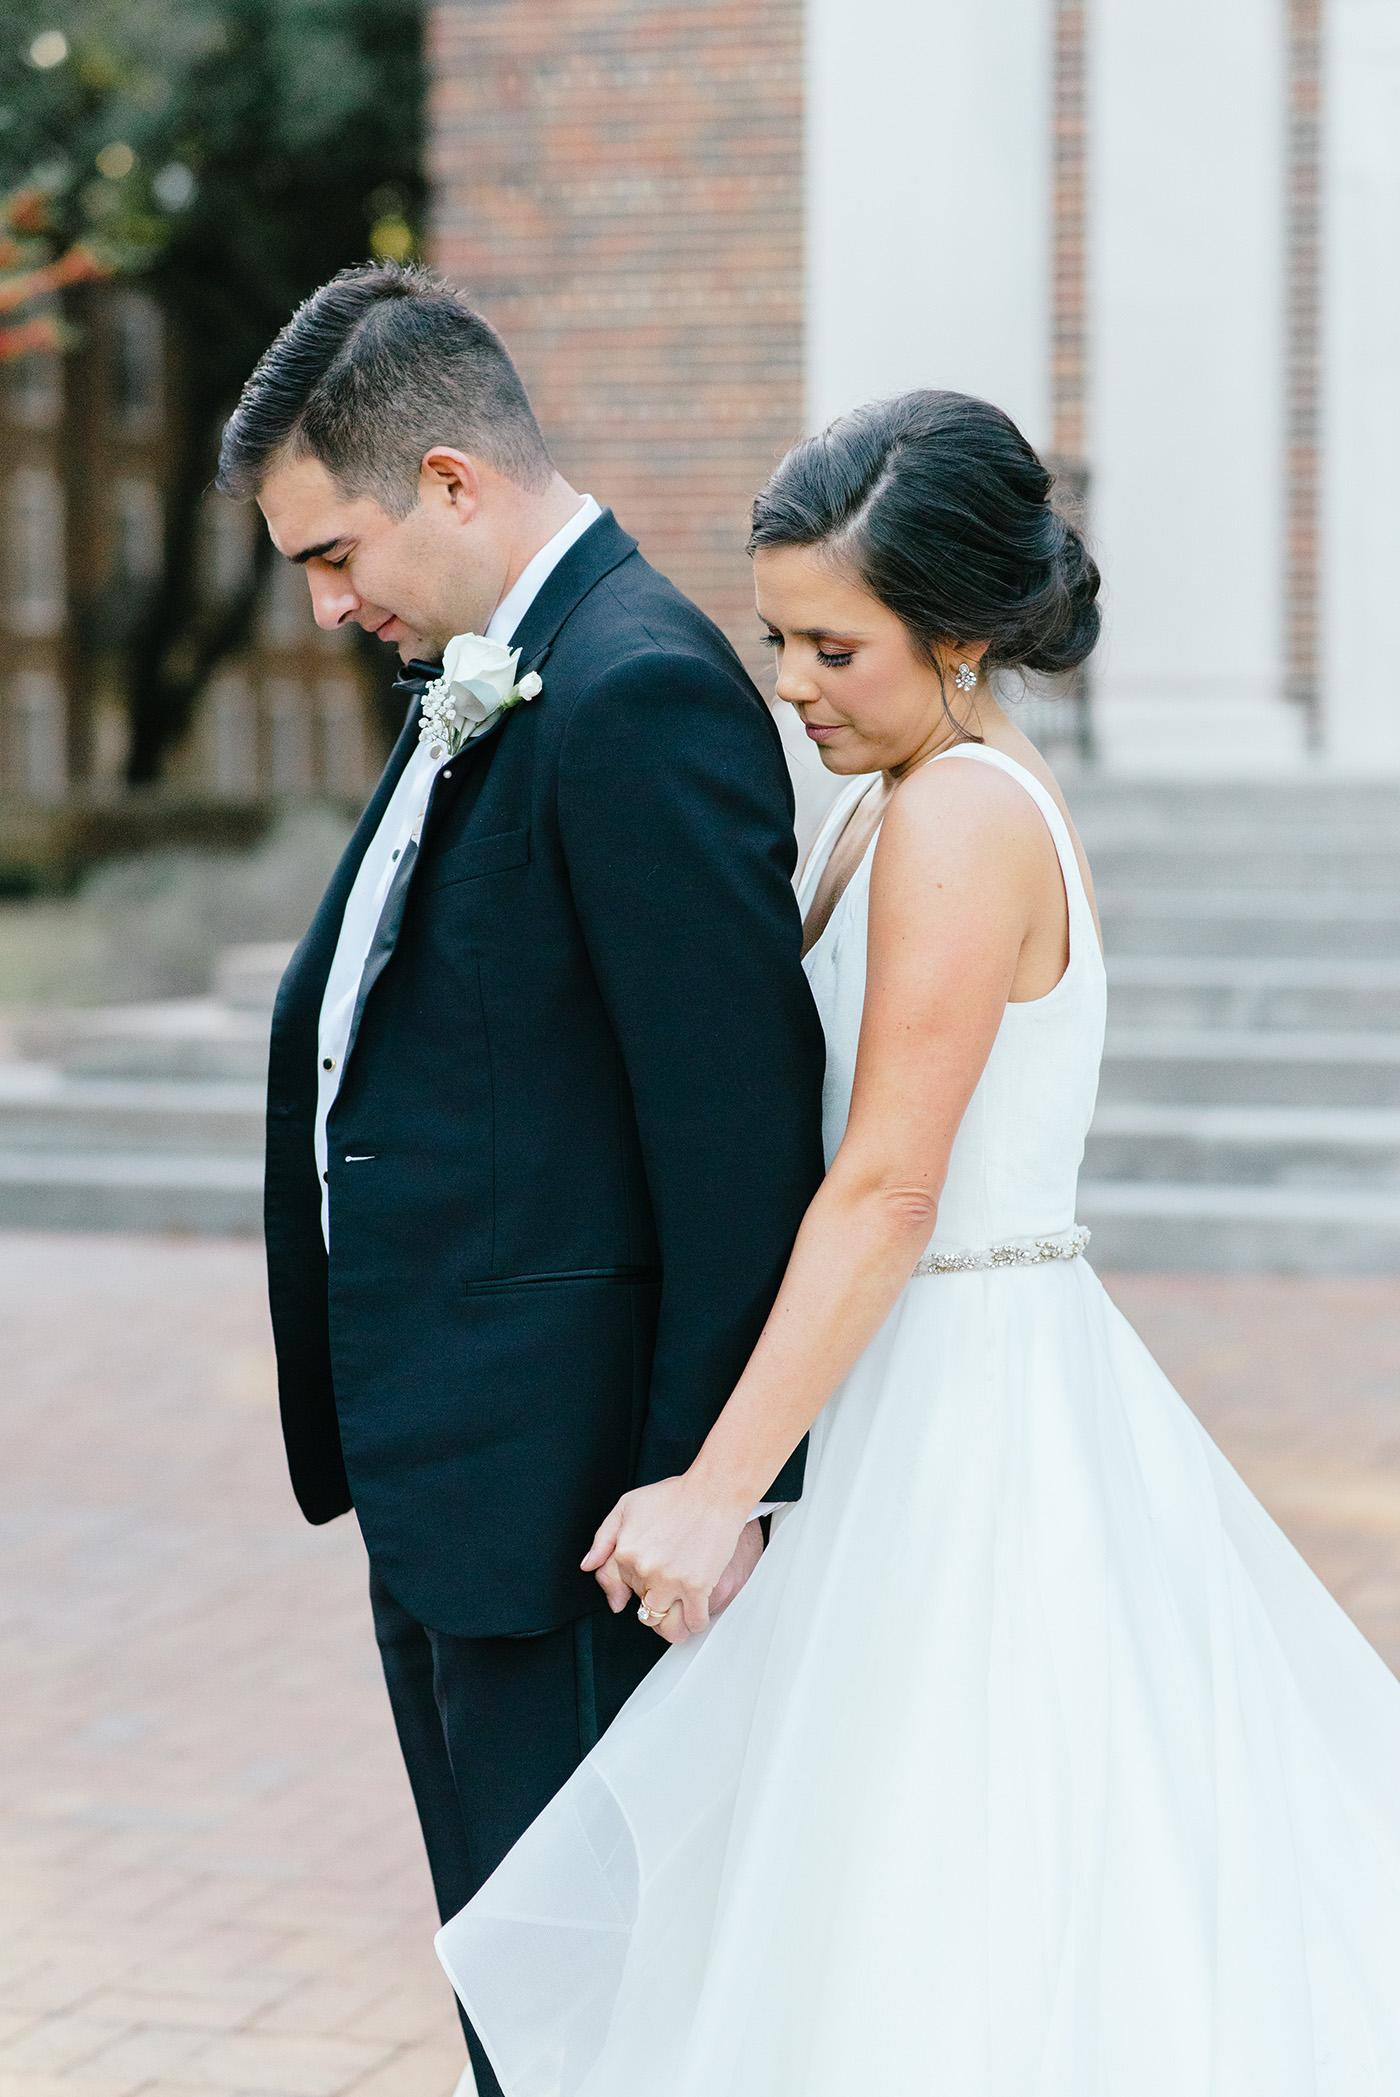 Dallas Wedding Planner - Winter Wedding at The Room on Main - Allday Events - 100.jpg